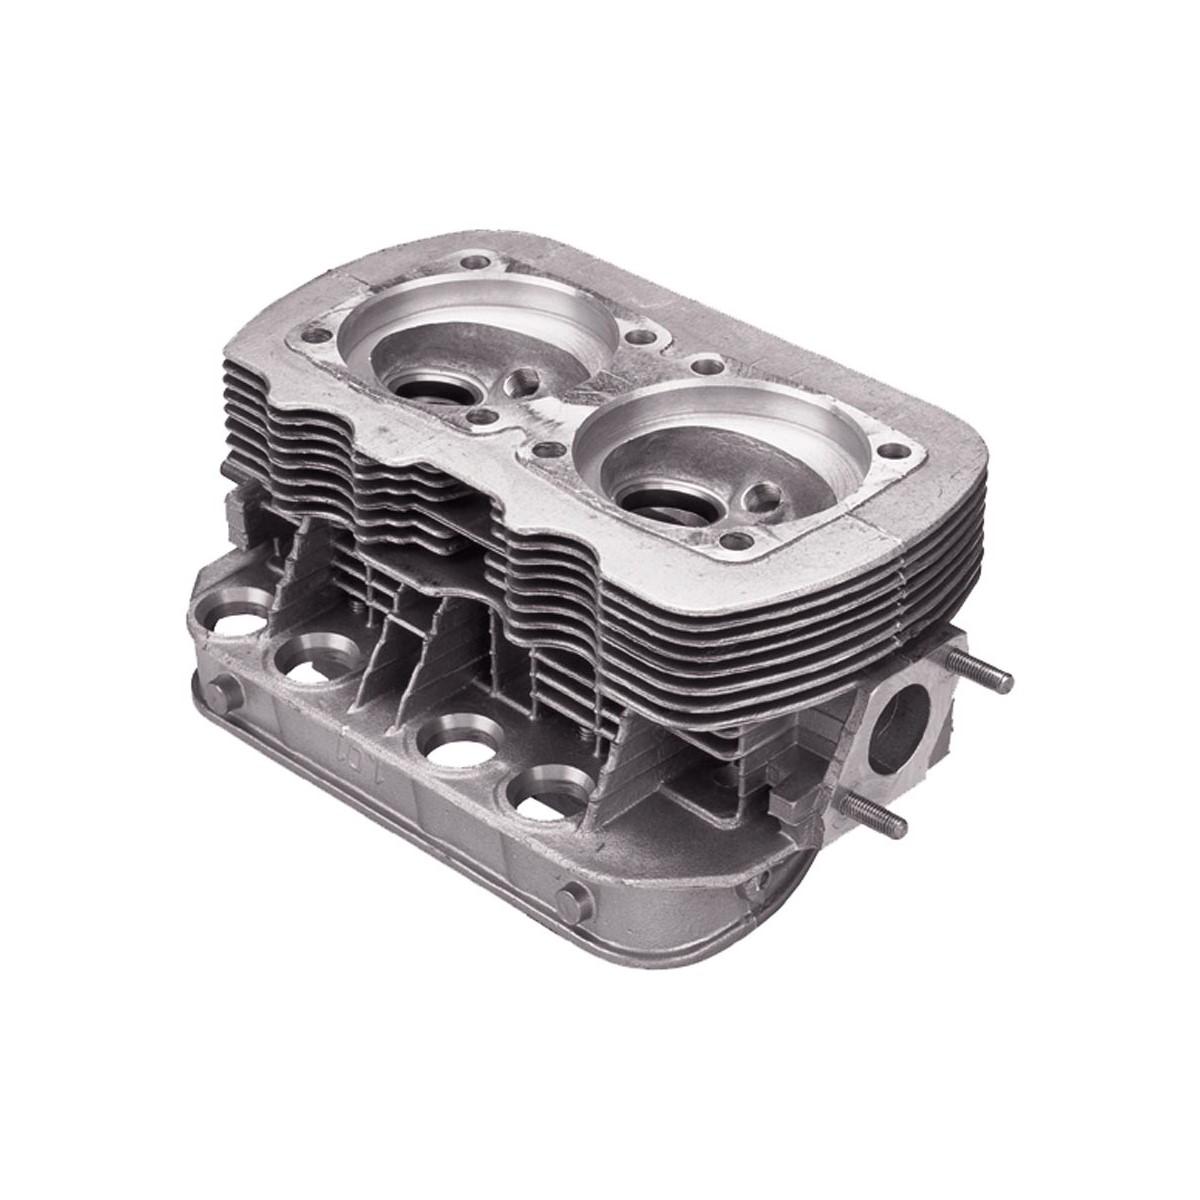 Cabeçote motor Kombi 1600 85 a 2005 - 6 Aletas Tork Moderno